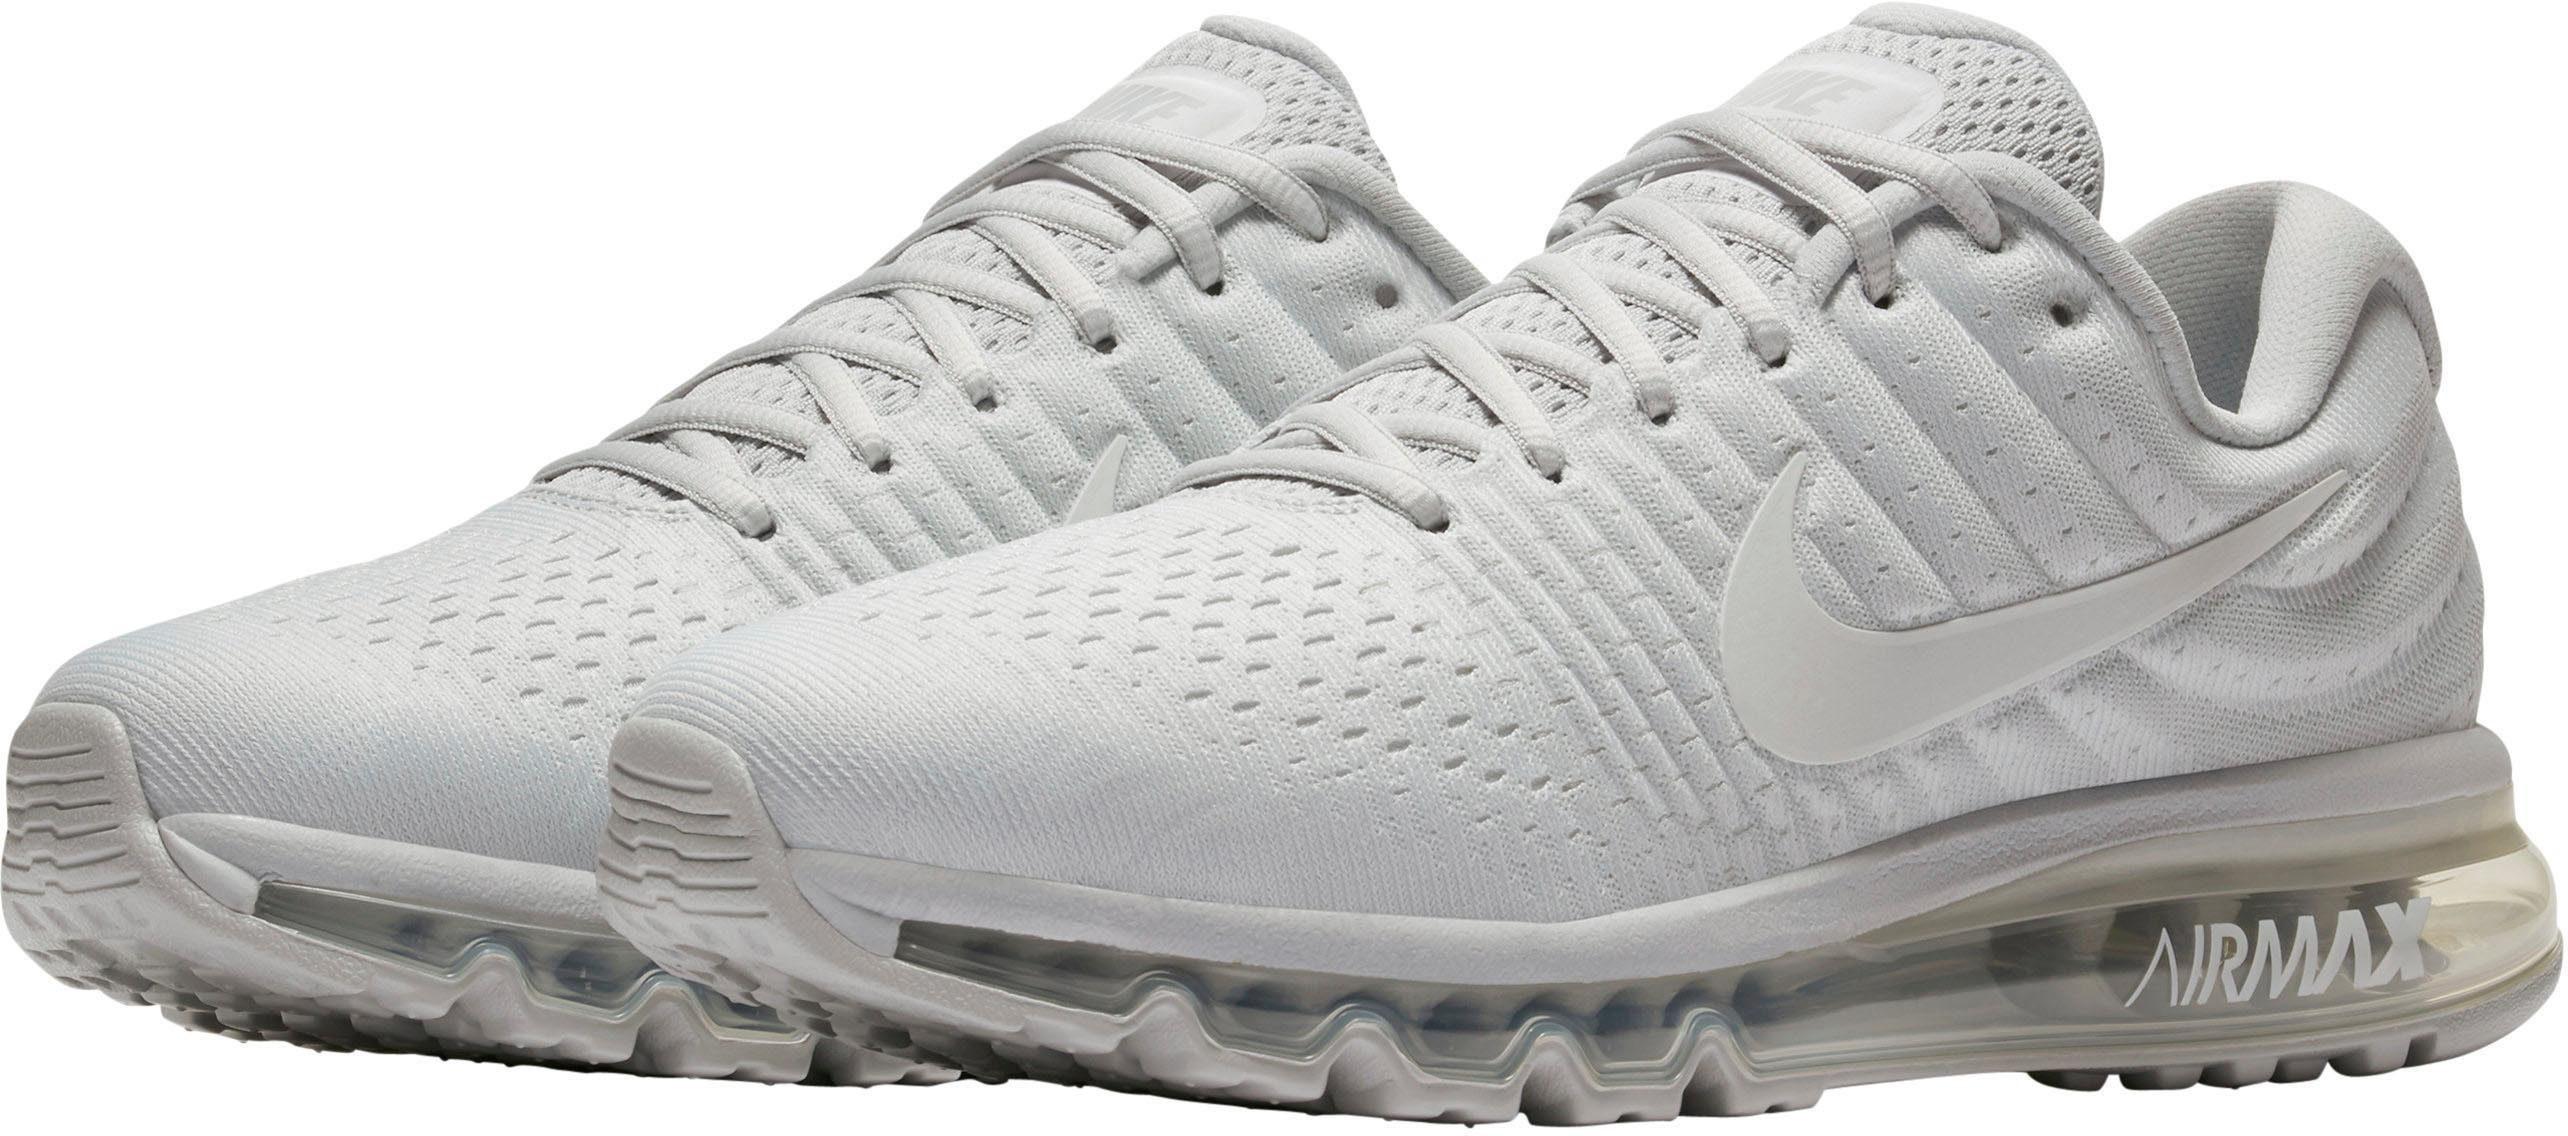 Nike Sportswear »AIR MAX 2017 SE« Sneaker kaufen | OTTO